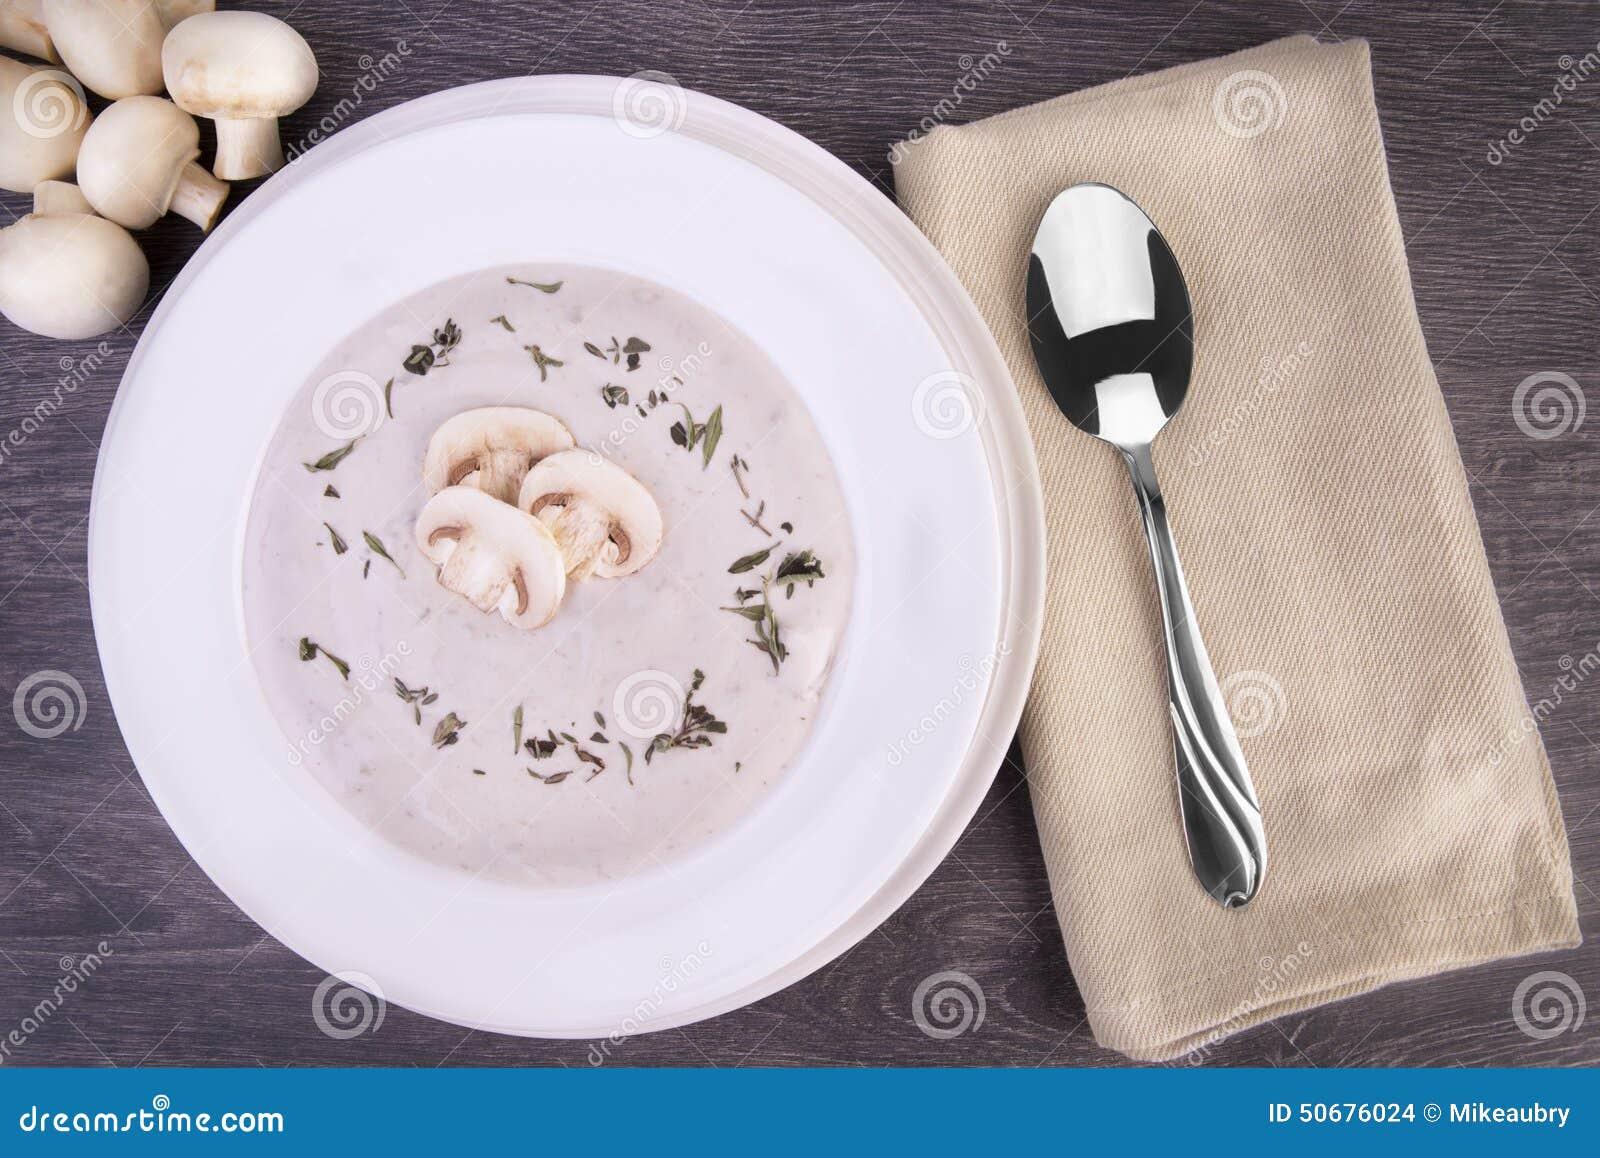 Download 在一个白色碗的新鲜的蘑菇汤 库存照片. 图片 包括有 美食, 板条, 顶层, 素食主义者, 弯脚的, 牛至 - 50676024